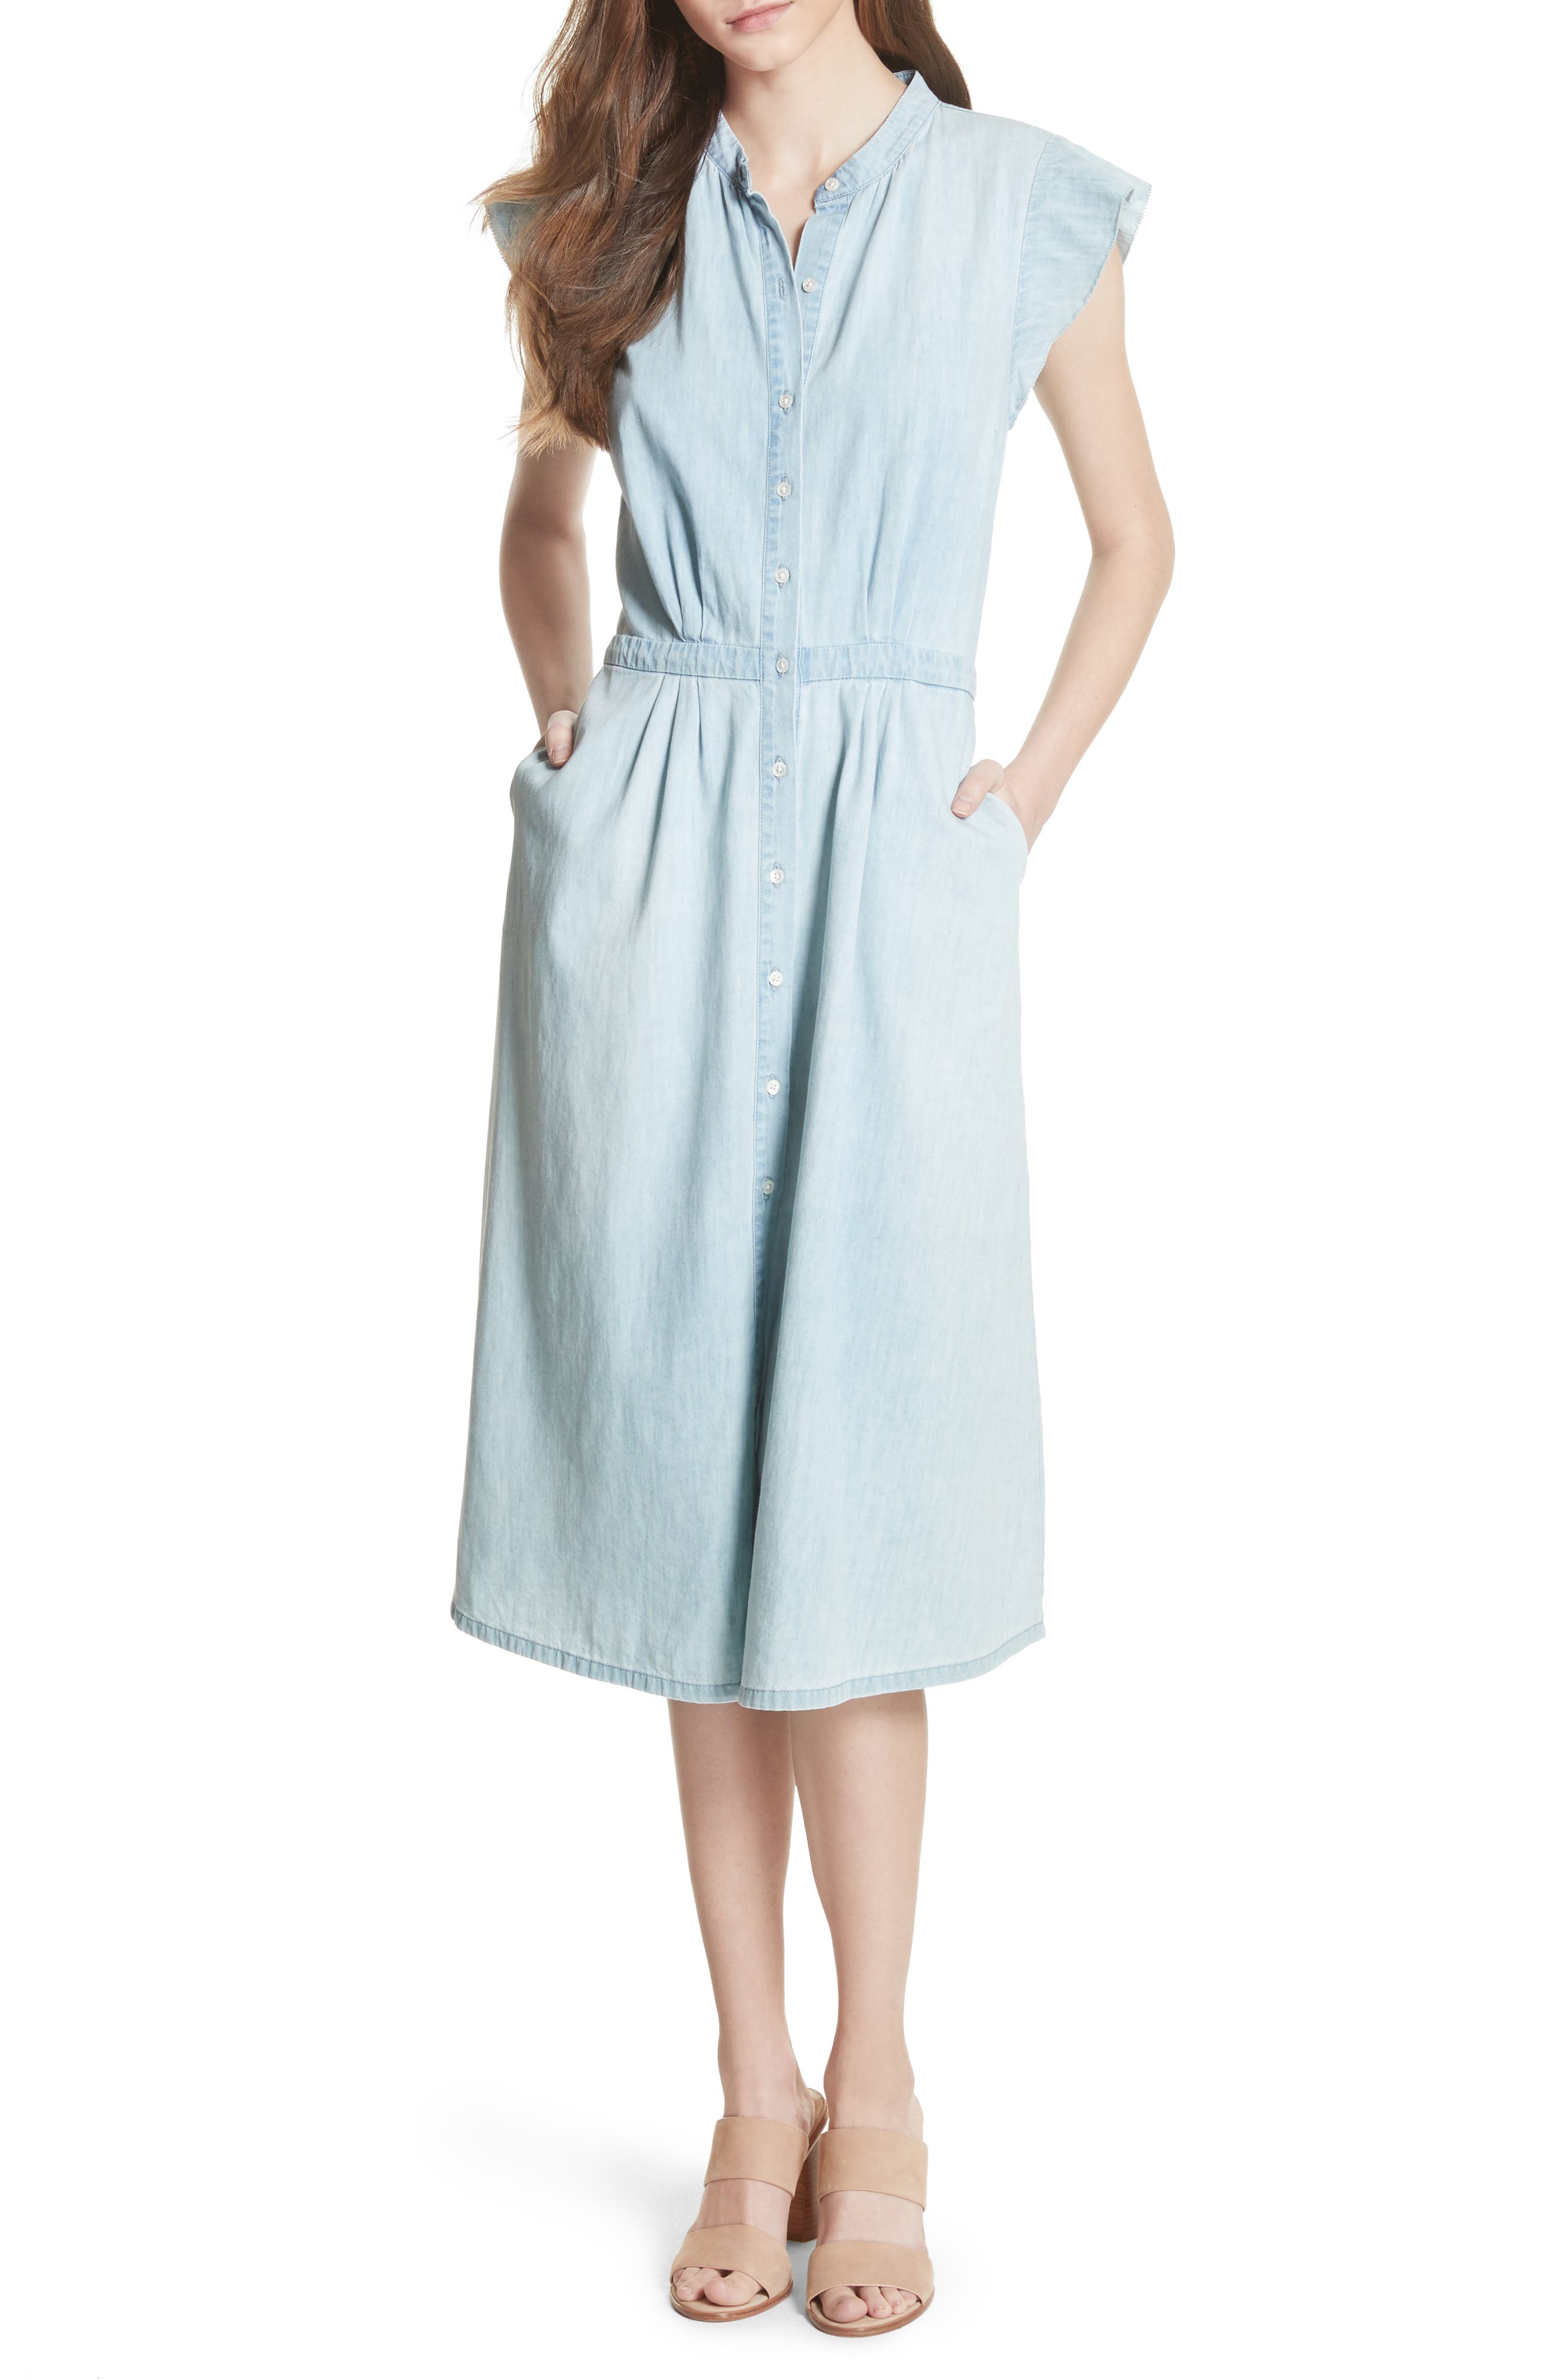 Awel Ruffle Chambray Shirtdress,                         Main,                         color,